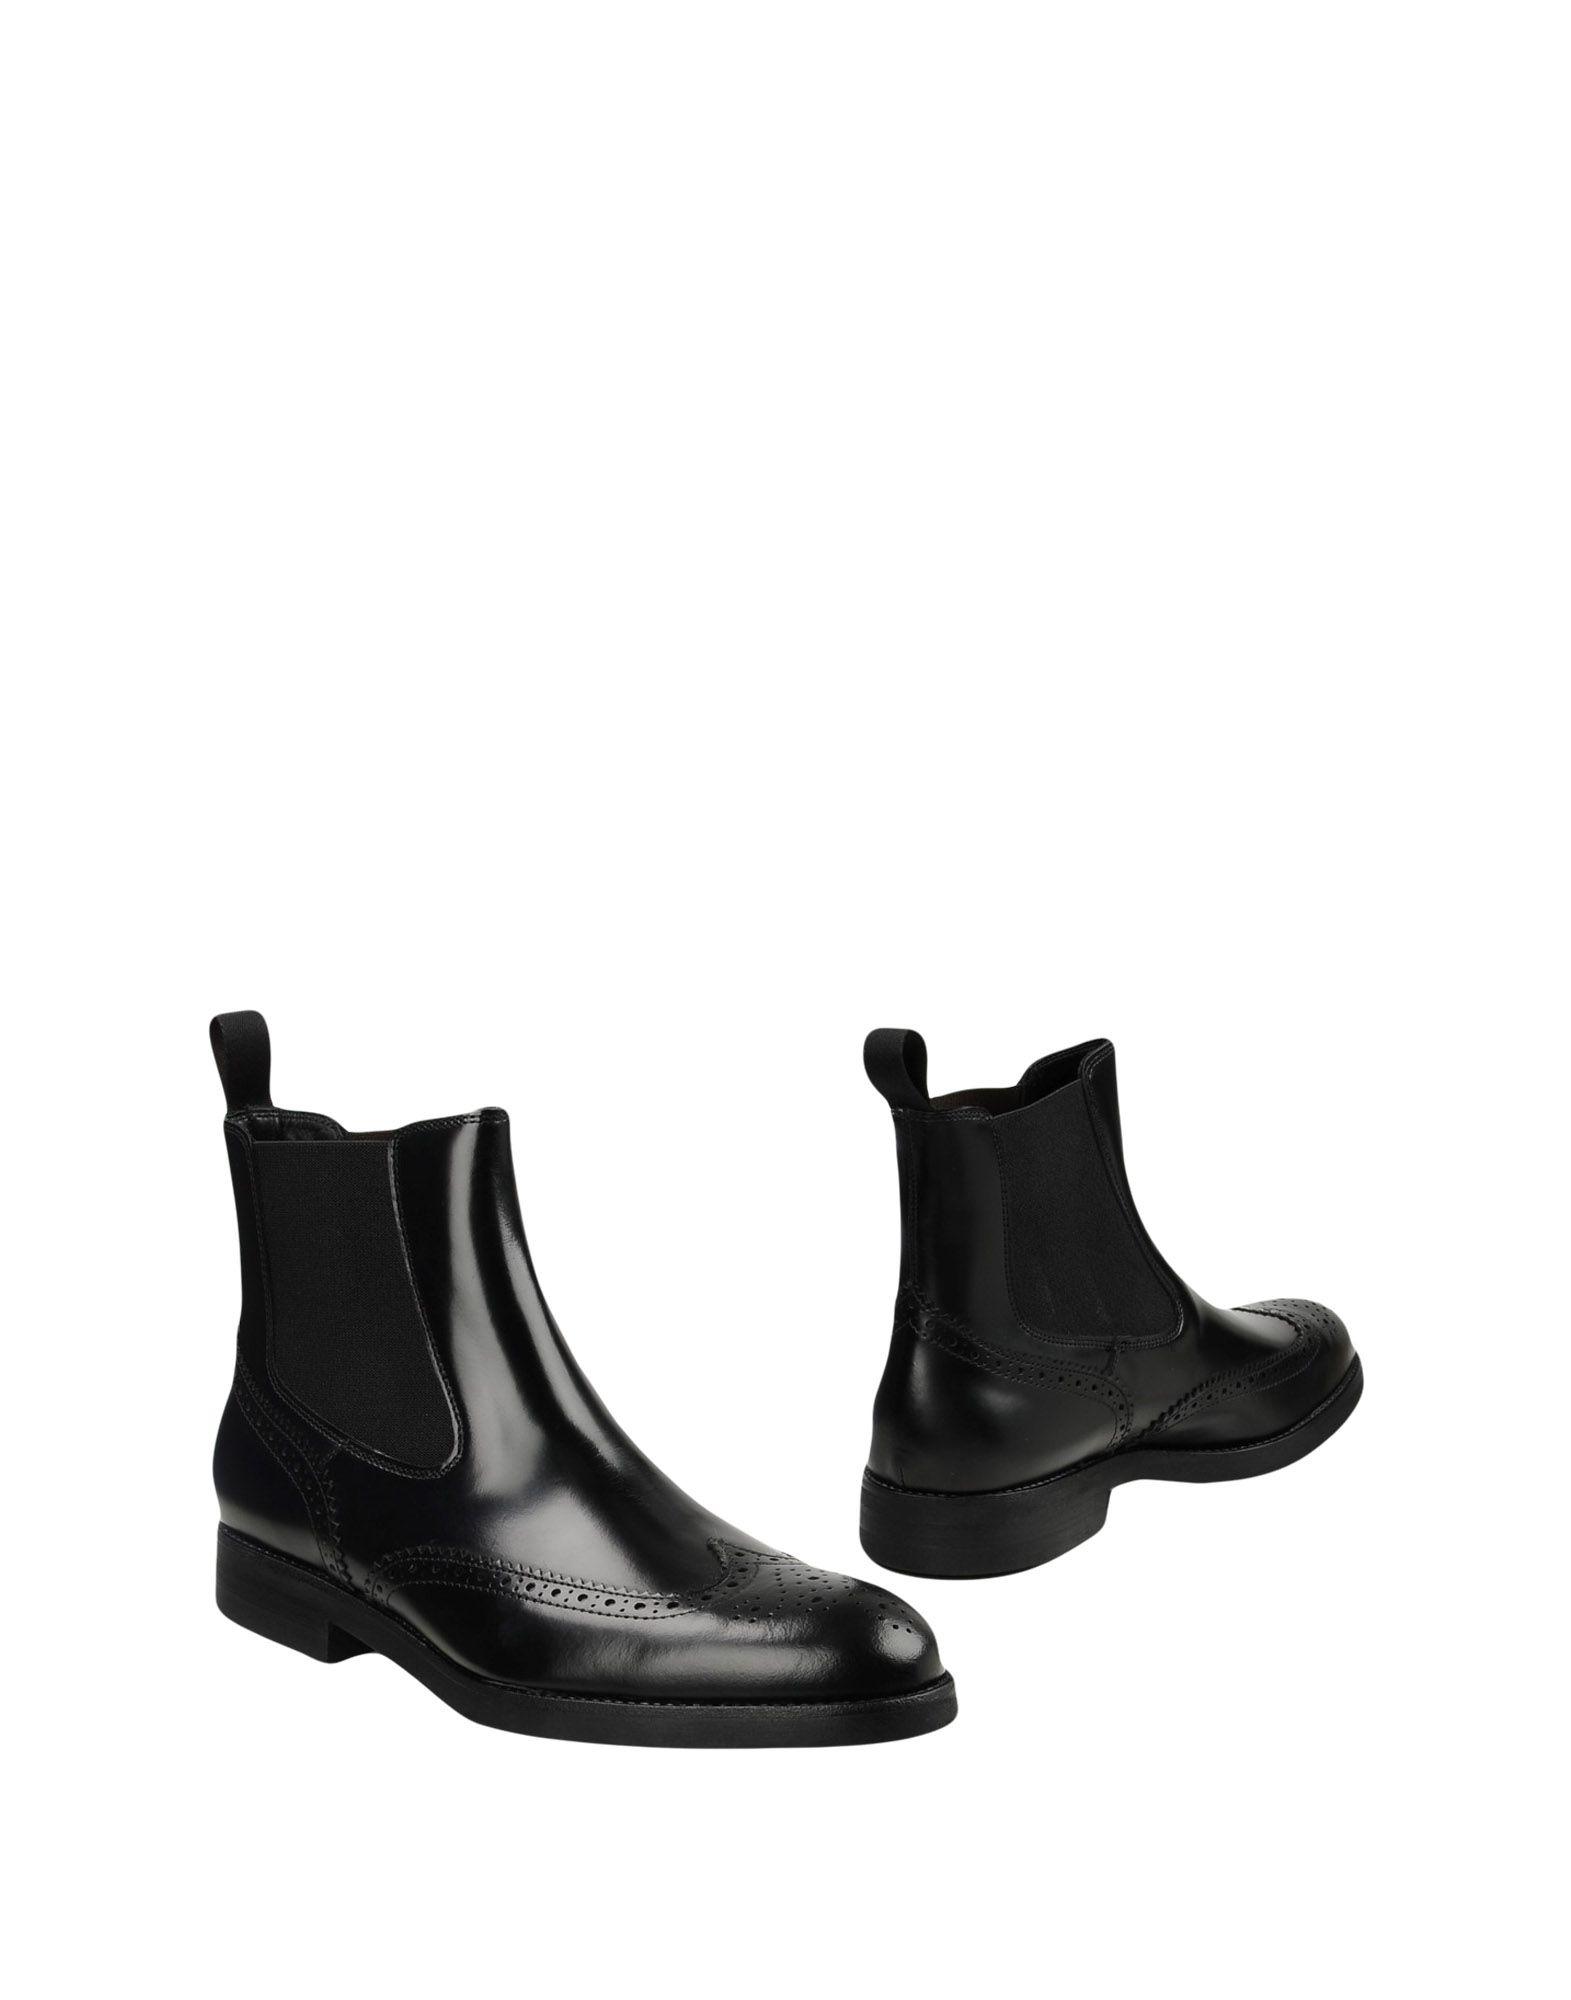 J. HOLBENS Полусапоги и высокие ботинки george j love полусапоги и высокие ботинки